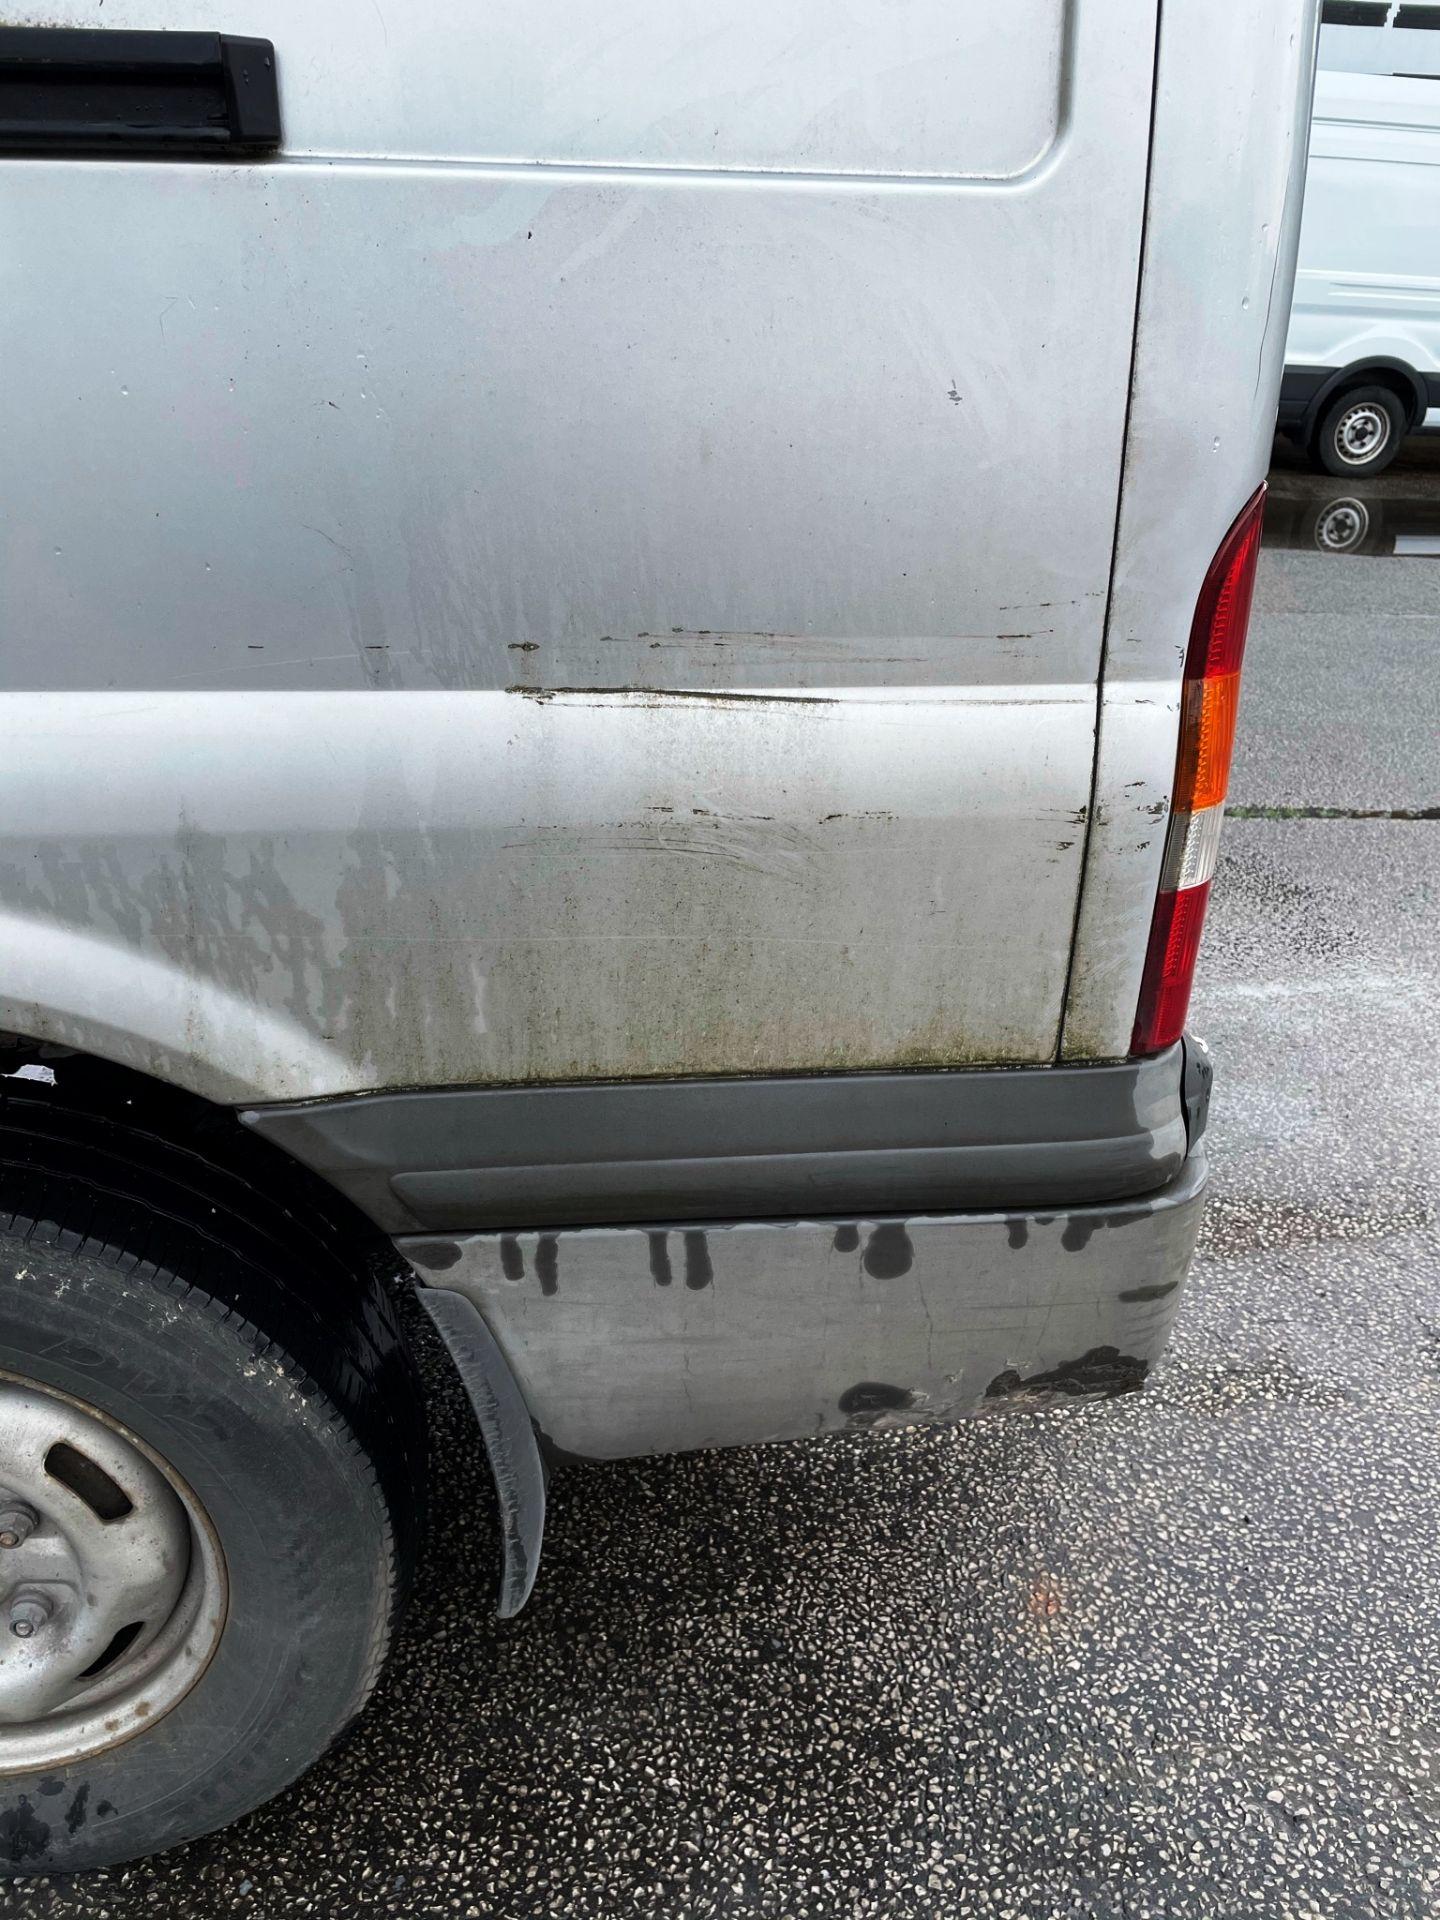 Ford Transit 350 LWB Panel Van   05 Plate  168,443 Miles - Image 14 of 22